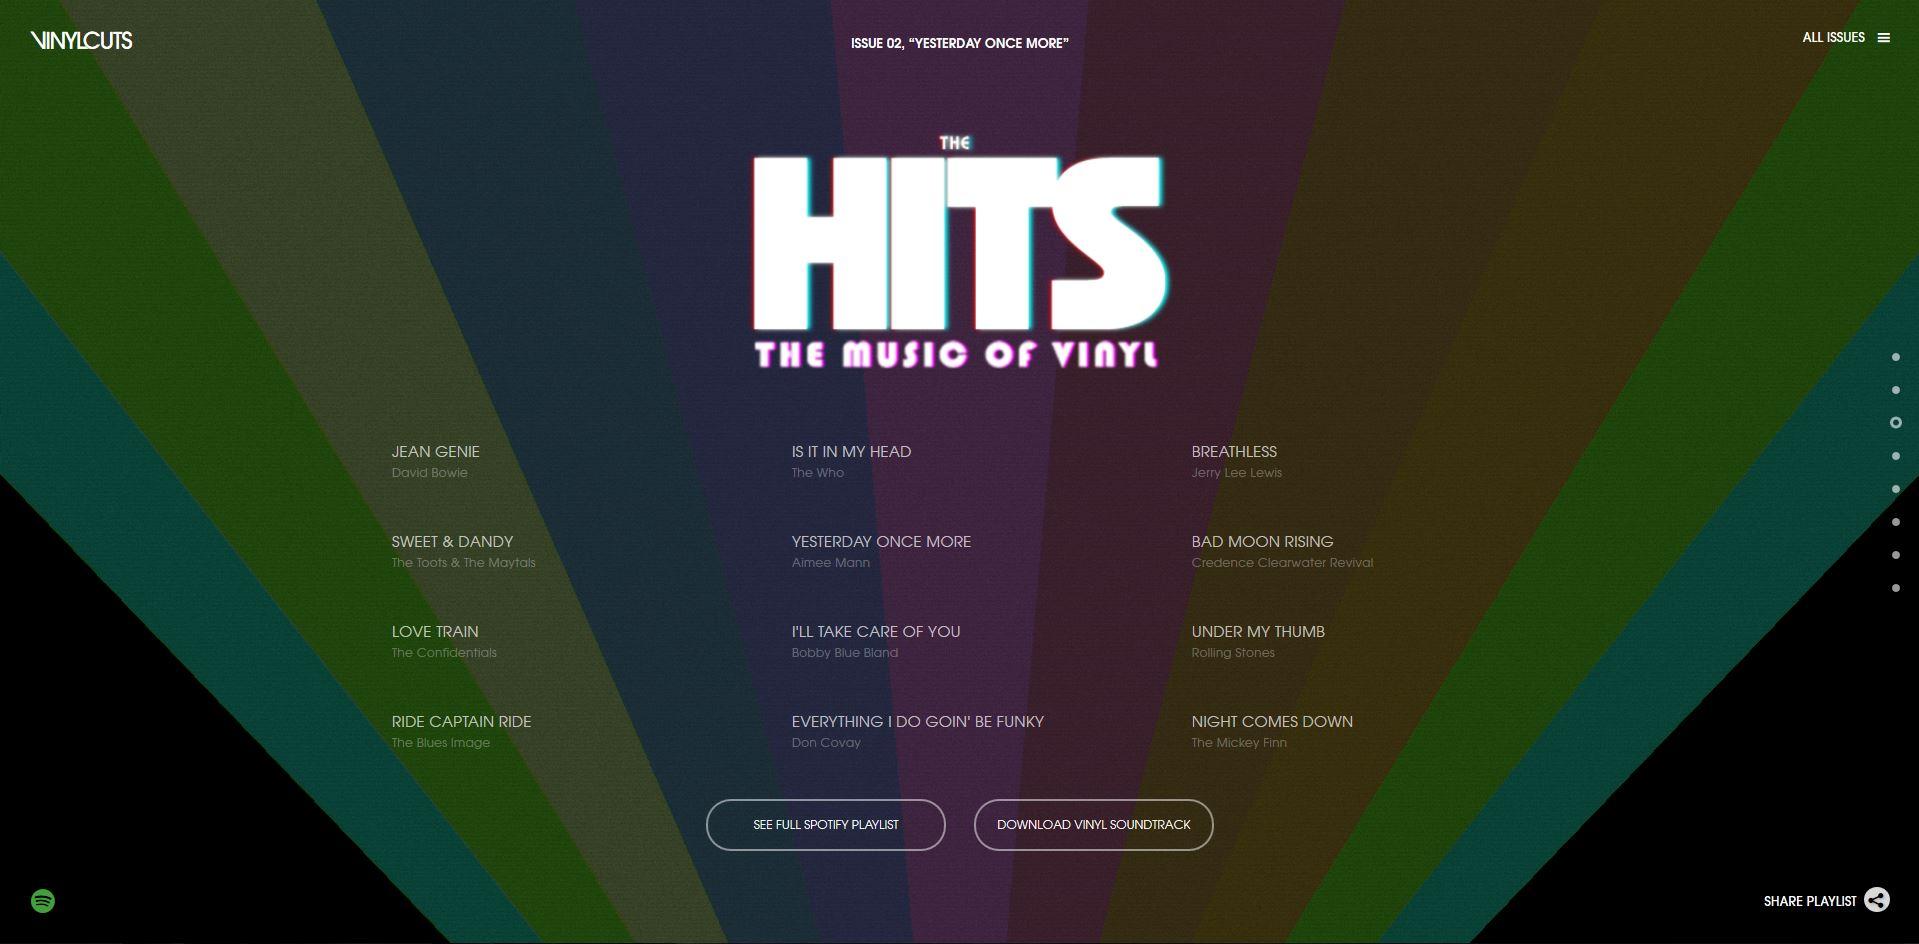 vinylcuts_2_music.JPG